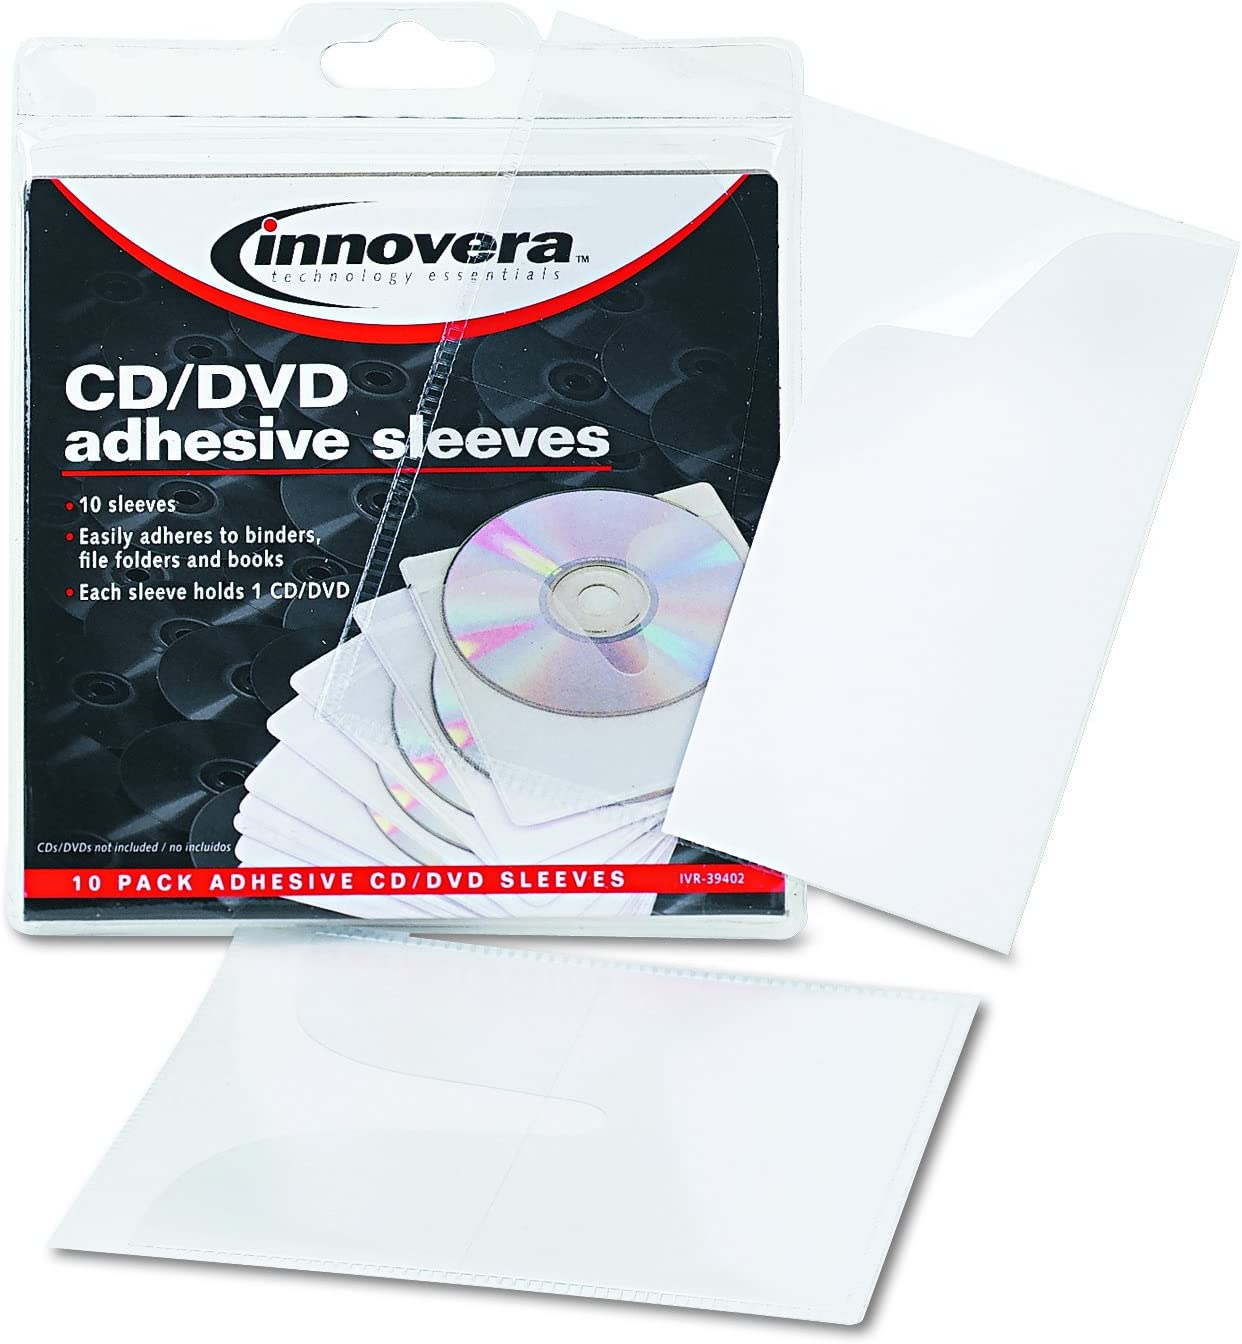 Pack of 10 Innovera 39402 Self-Adhesive CD//DVD Sleeves